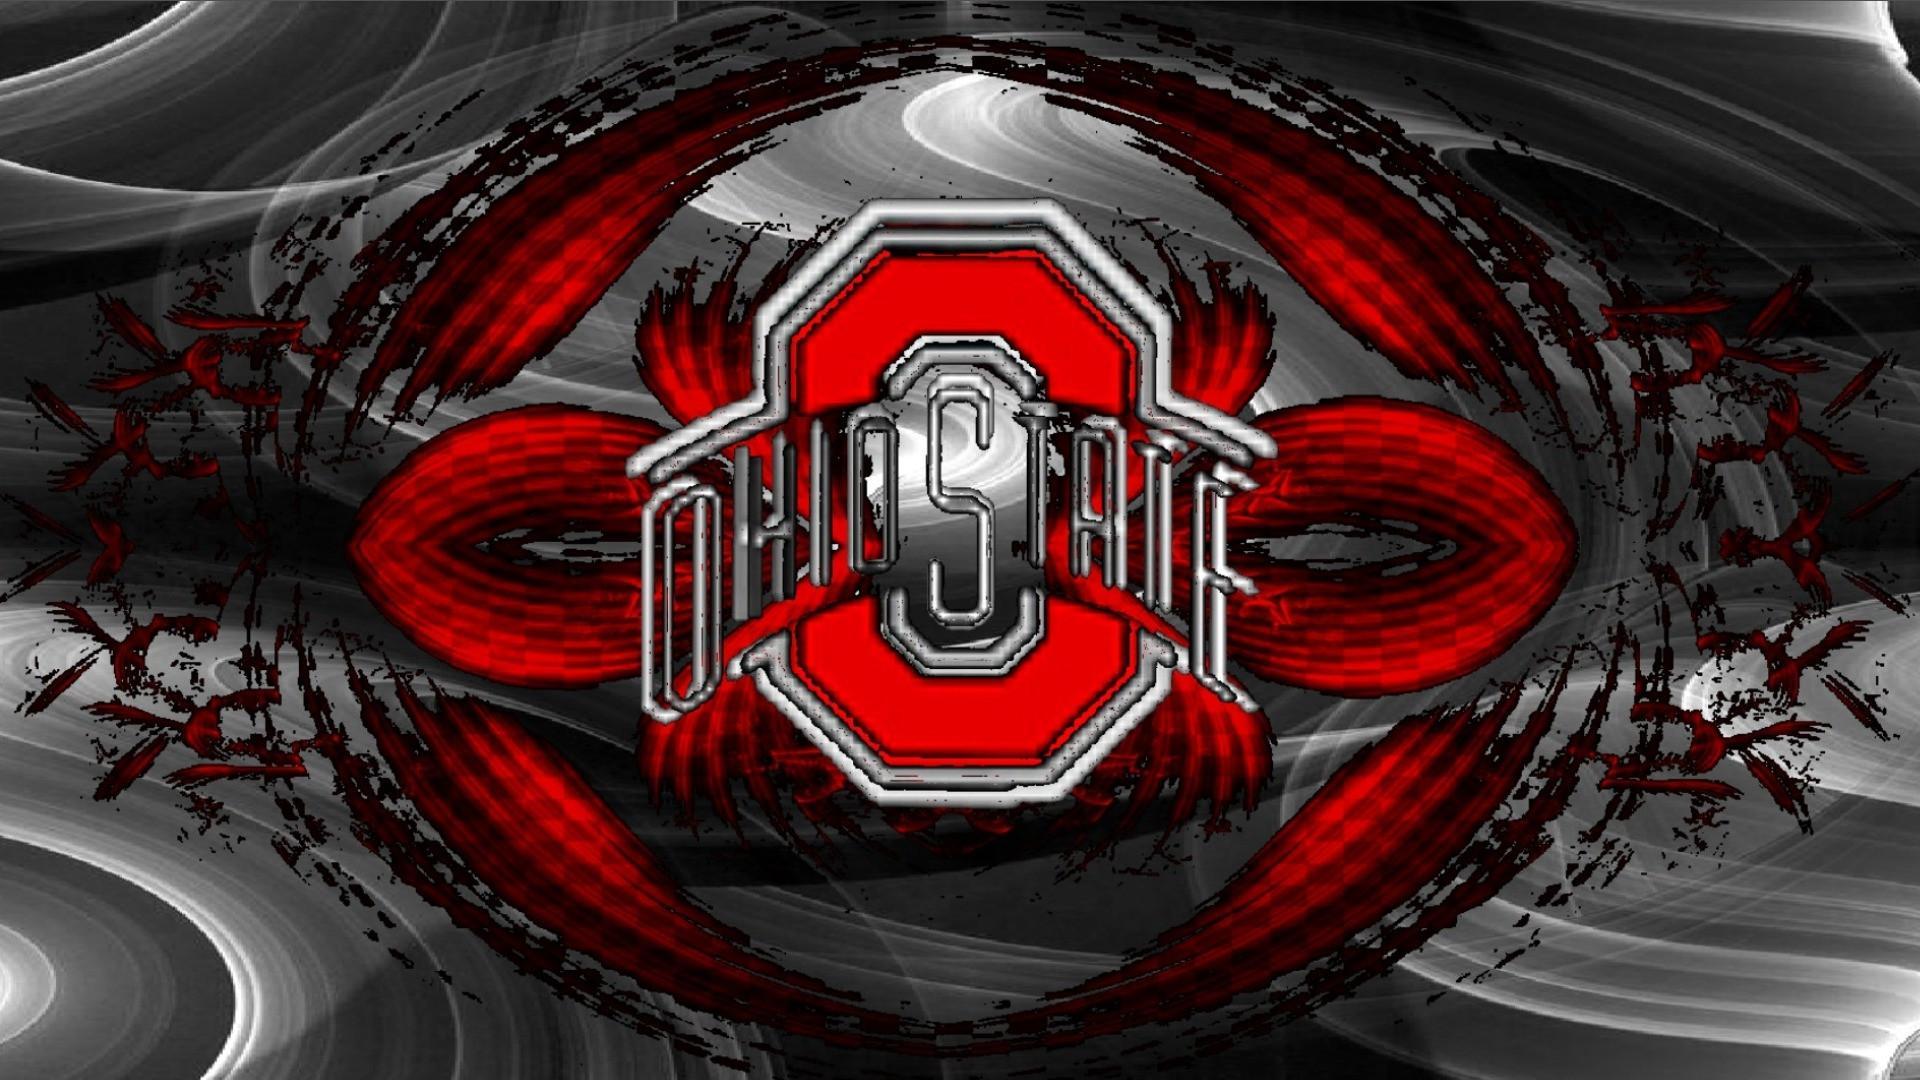 Ohio State Buckeyes Football Wallpapers | PixelsTalk.Net